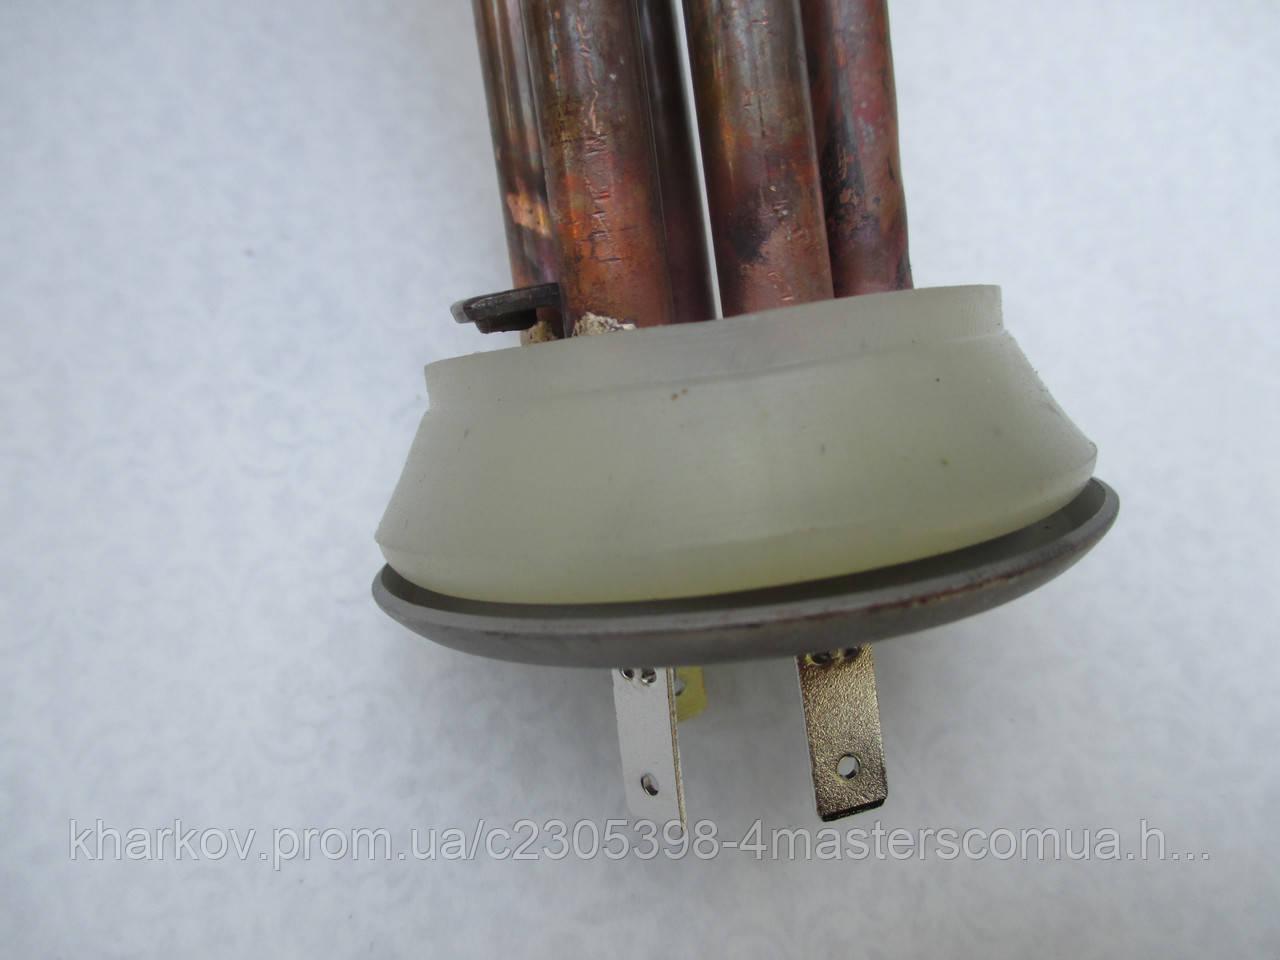 Прокладка для бойлера Термекс под фланец 63 мм